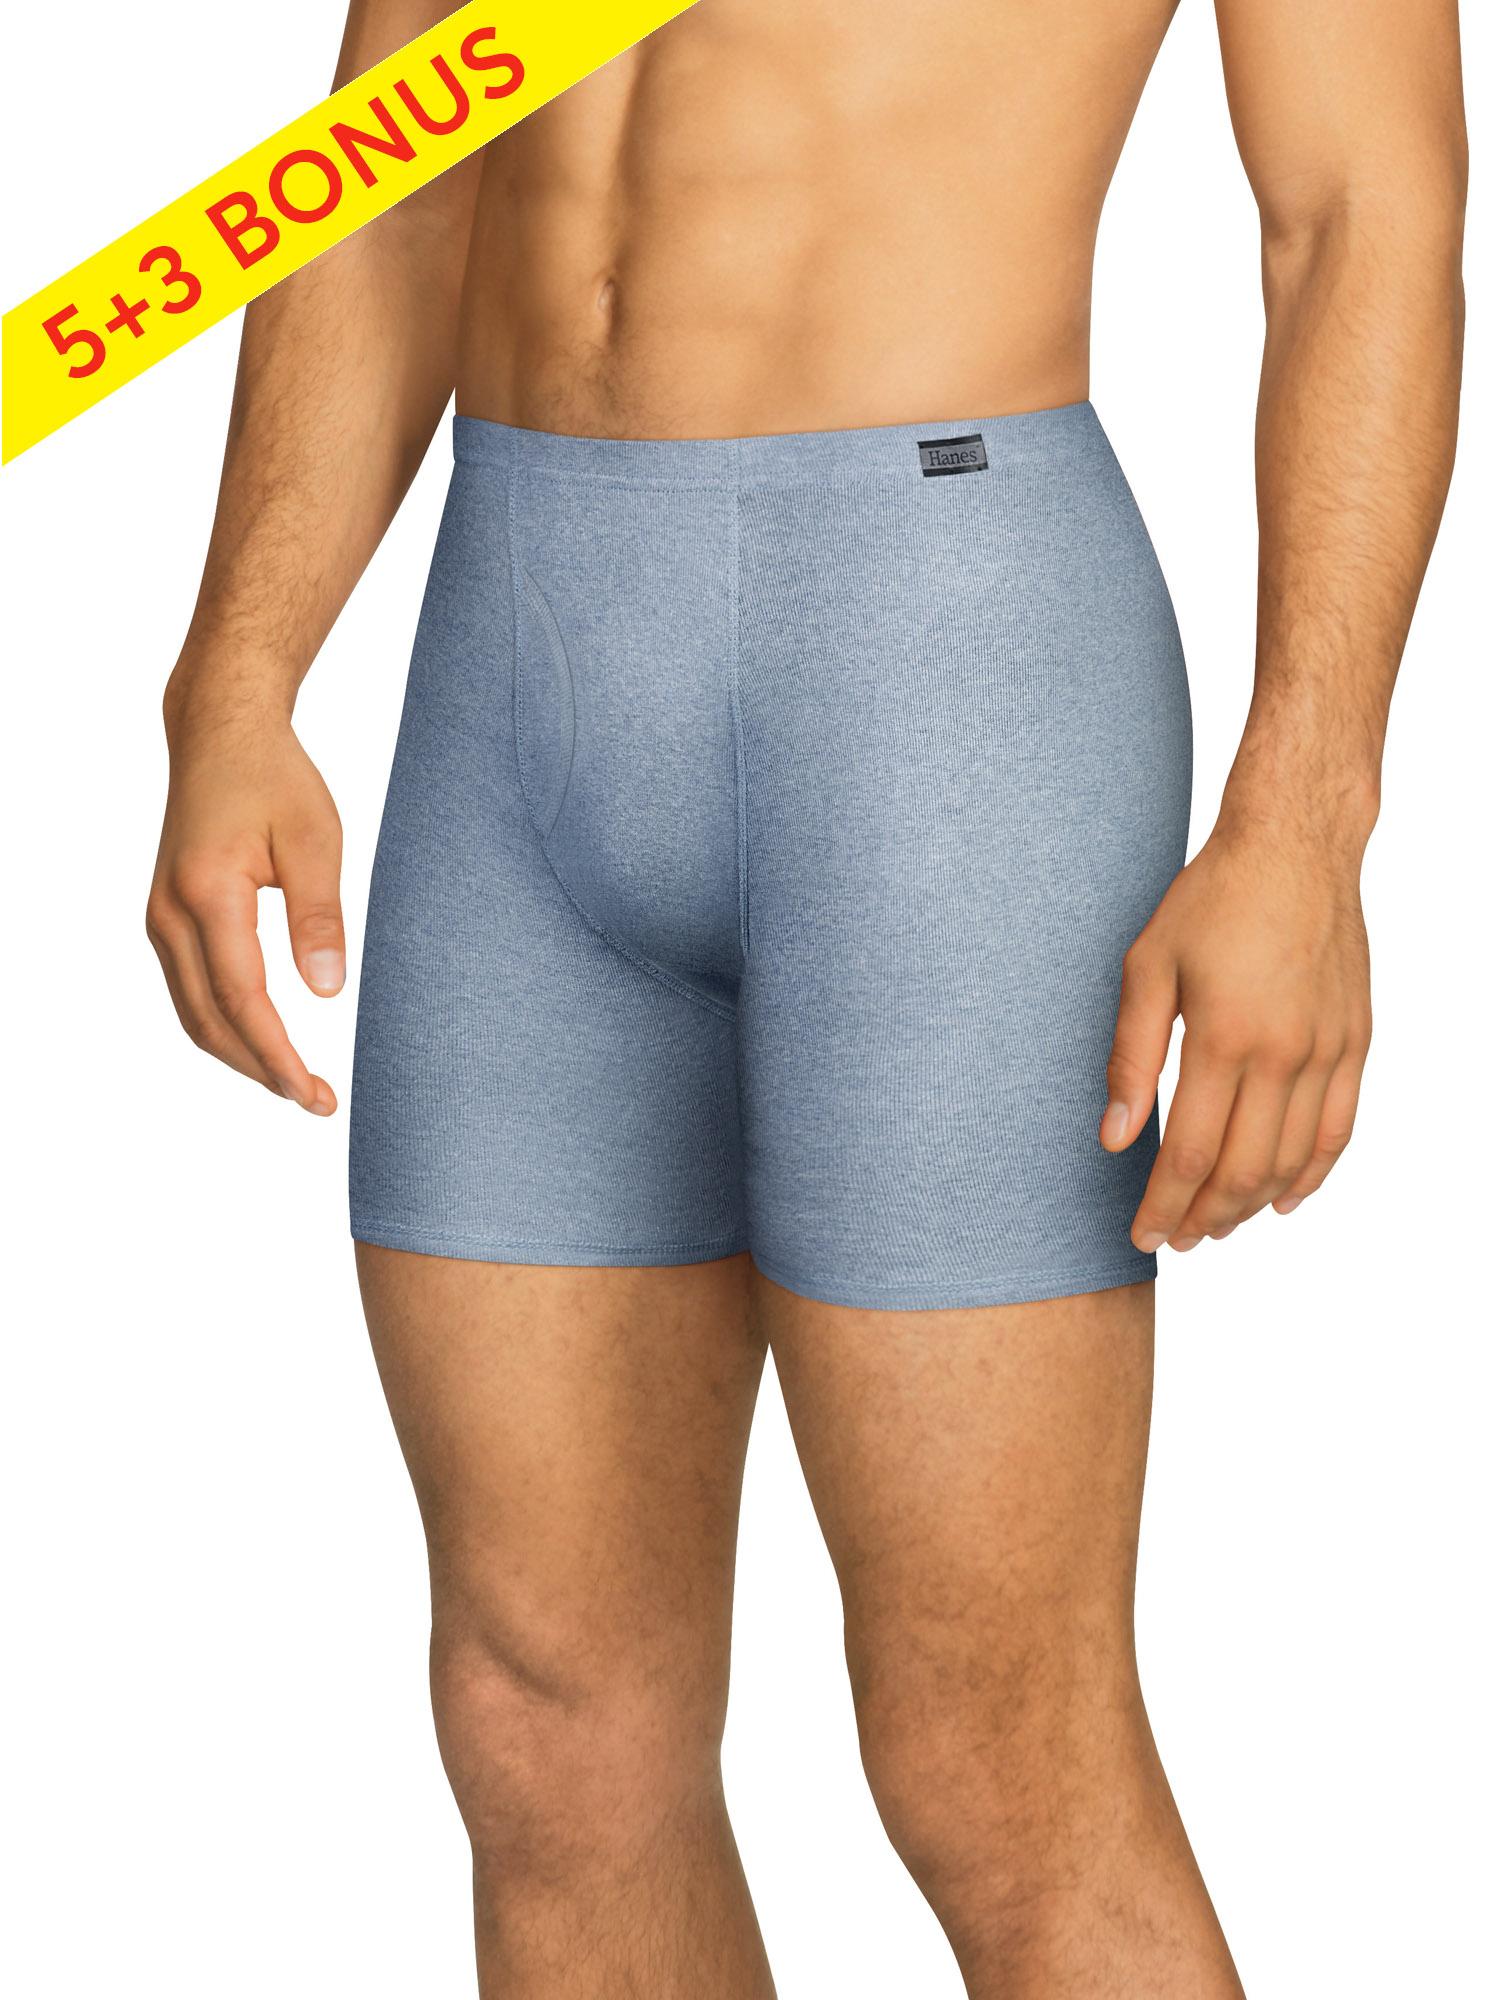 Hanes - Hanes Men's Tagless ComfortSoft Waistband Boxer Brief, 5 + 3 Bonus Pack - Walmart.com